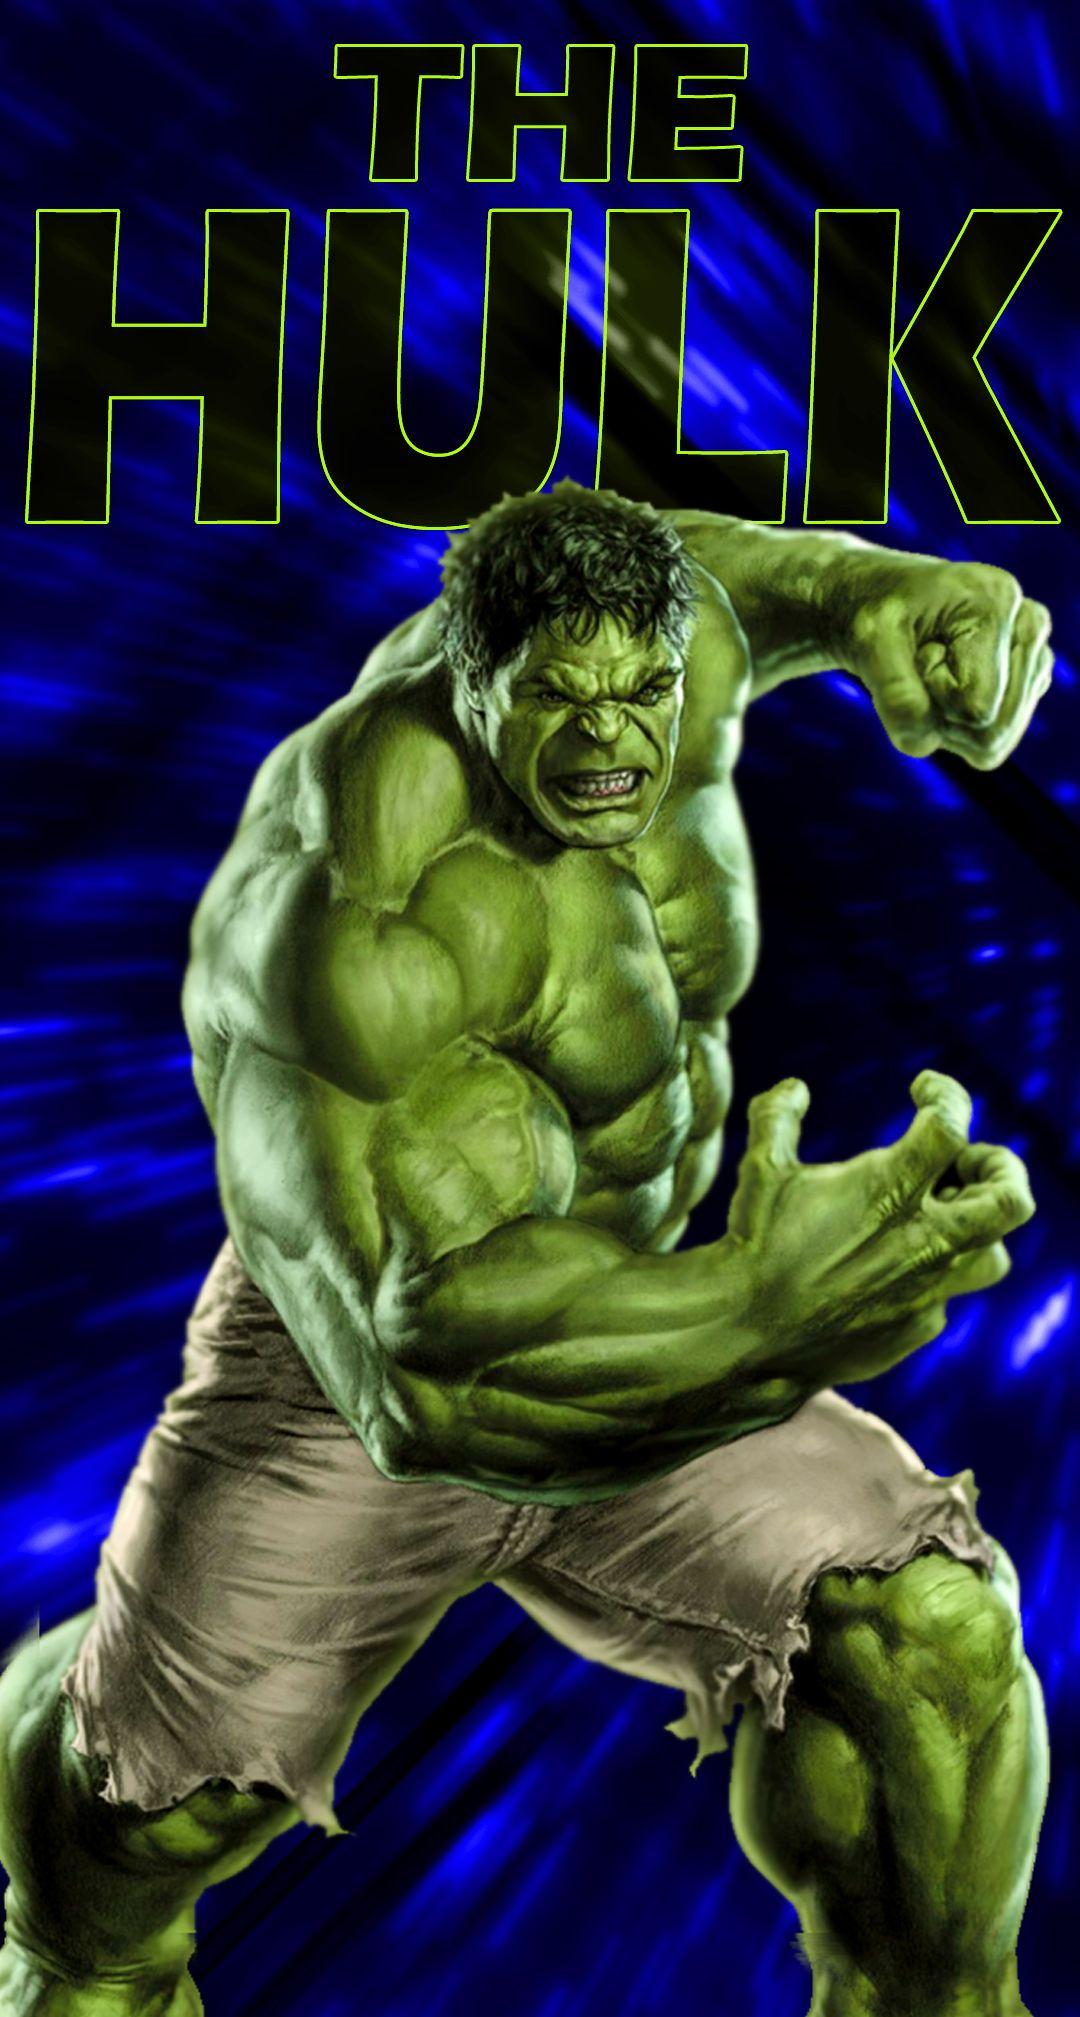 Hulk Latest Mobile Wallpaper 2018 Hulk Awesome Mobile